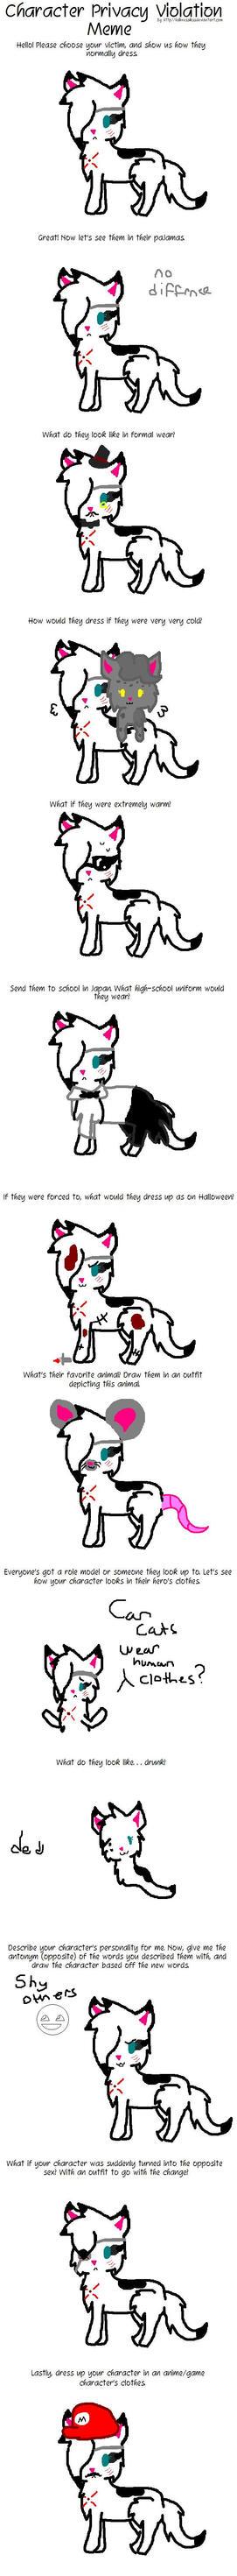 CharriePrivacyViolation Meme {Spotty} by WonderHooves